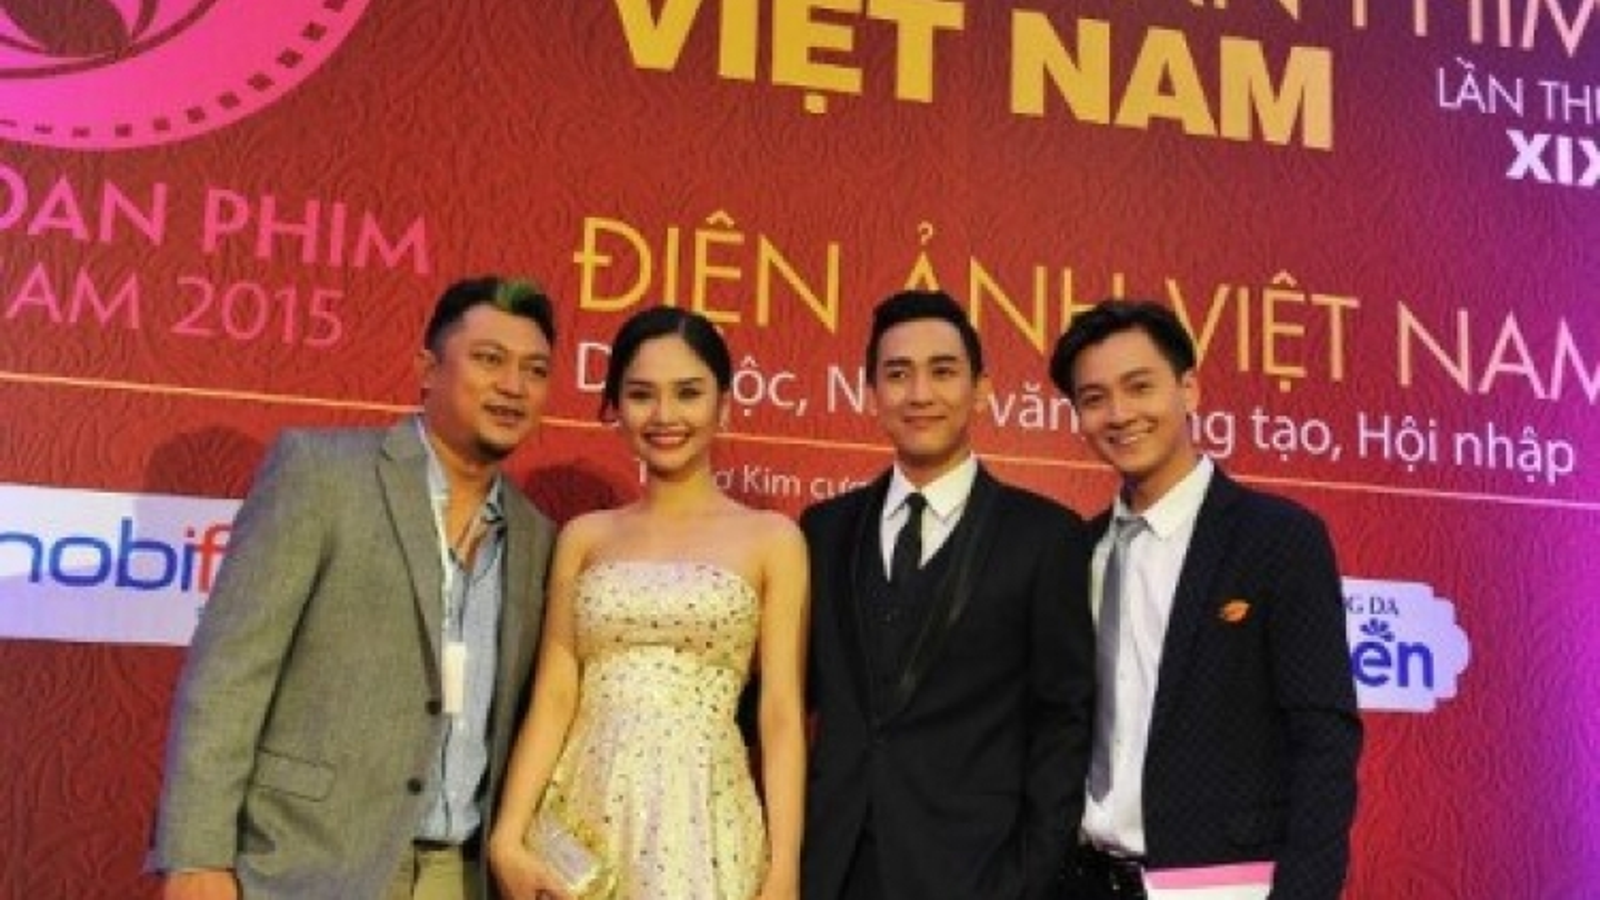 Da Nang hosts 20th Vietnam Film Festival